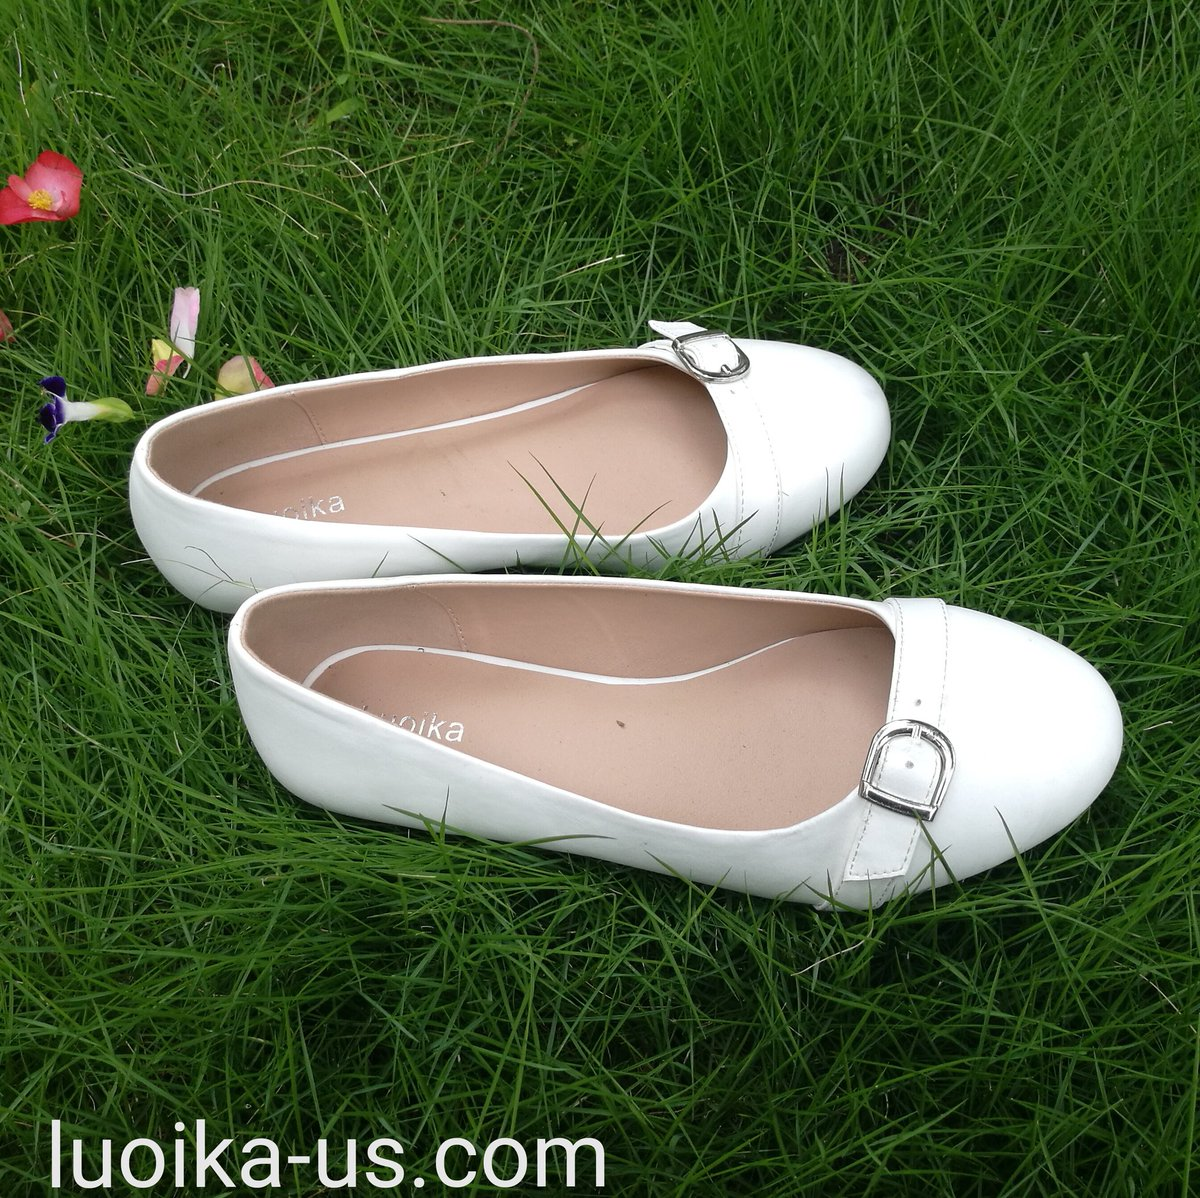 e32ecc0efd6b ... Slip On Round Toe Ballet Flats  widewidthflat  widebody   plussizefashion  plussizeshoes  fatfeet  wideshoes  wideshoes   fallflatshoes  weddingflatshoes ...